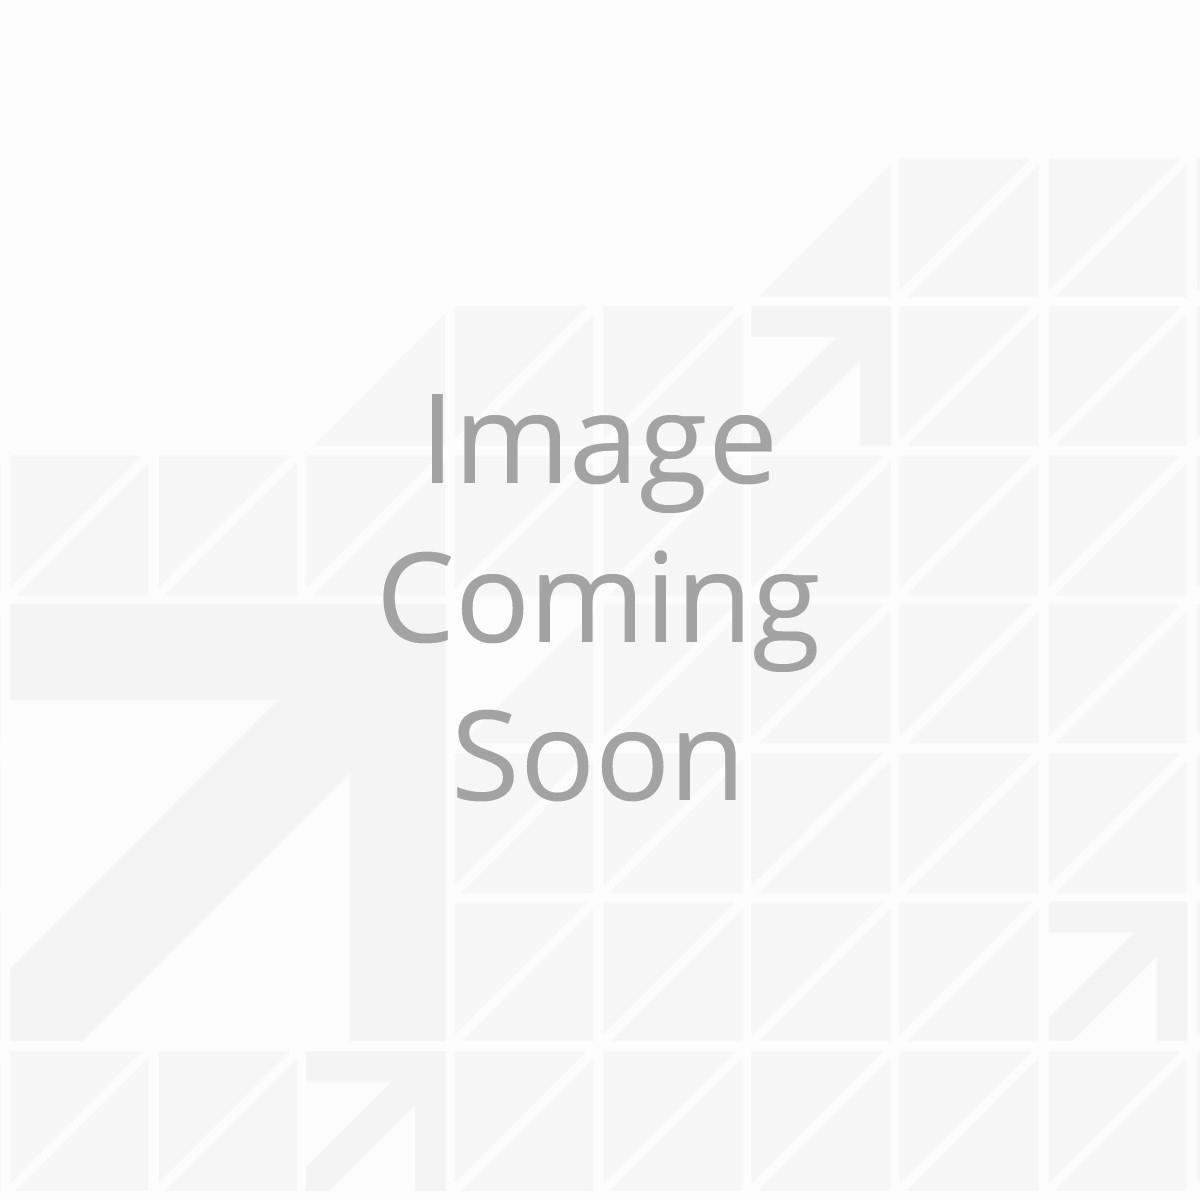 Custom Towed-Vehicle RV Wiring Harness Add-On